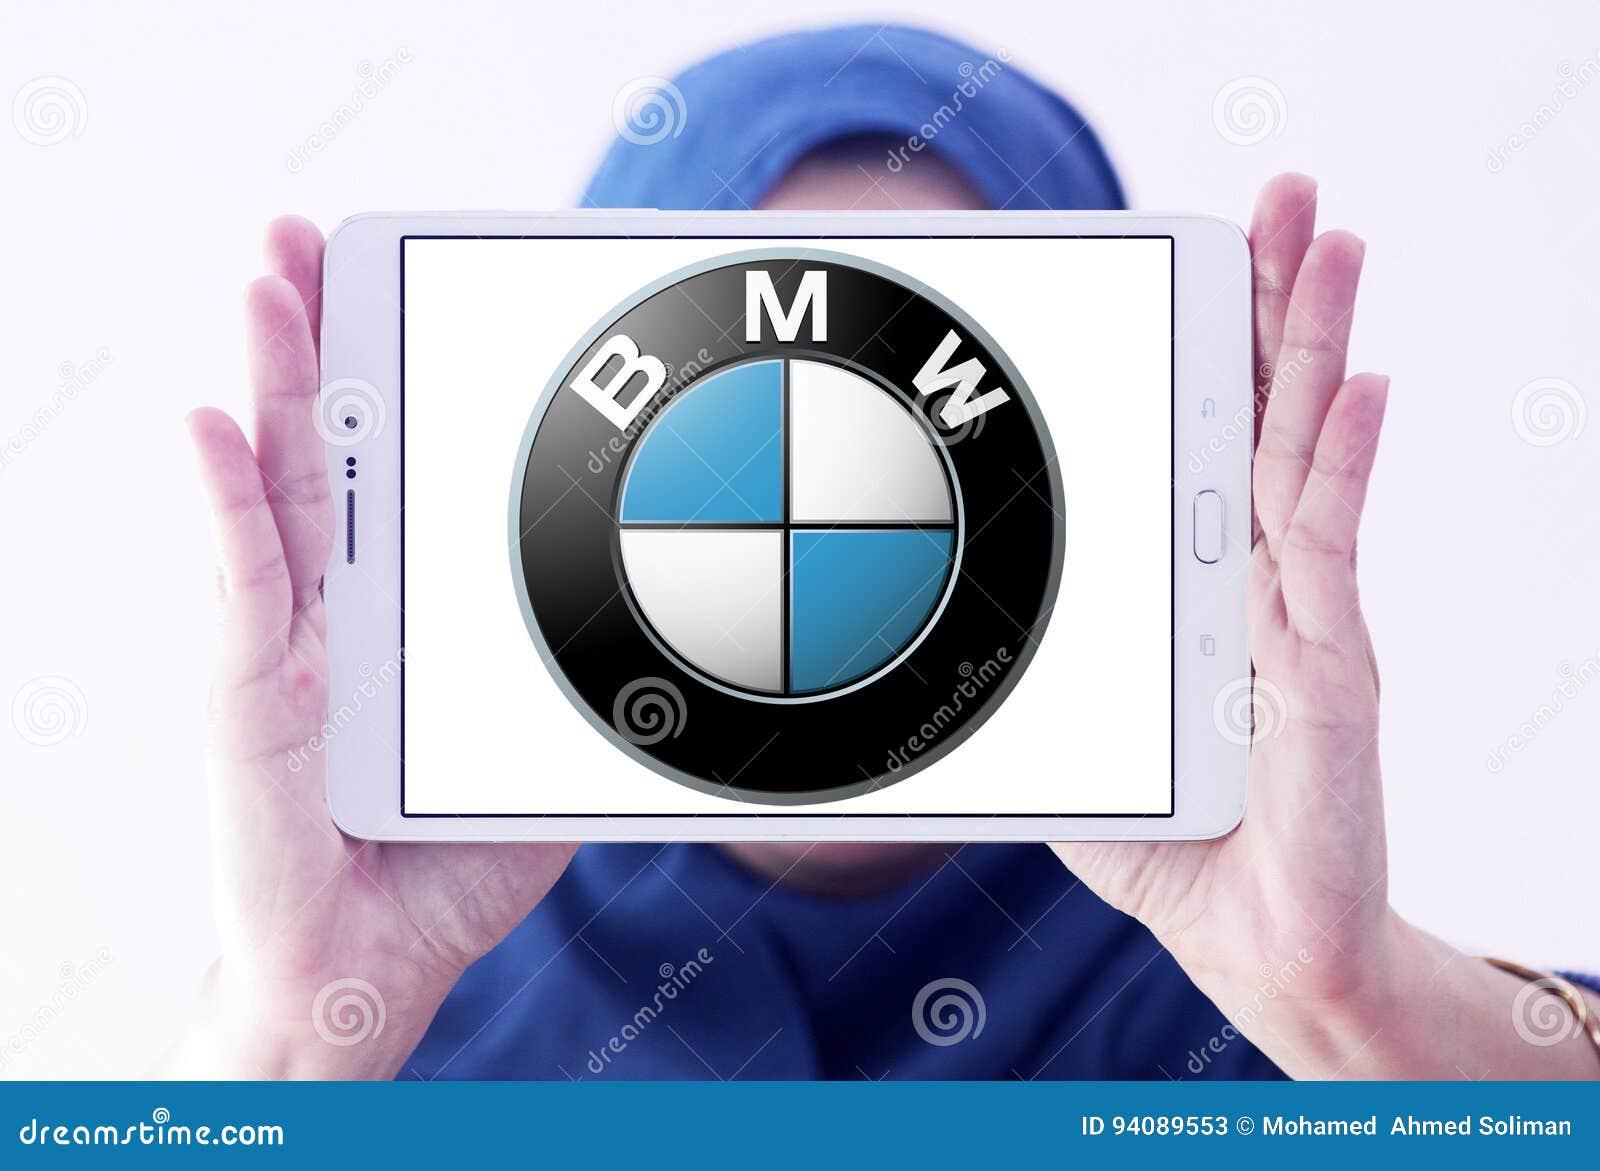 Bmw Logo Editorial Stock Photo Image Of Brand Phone 94089553